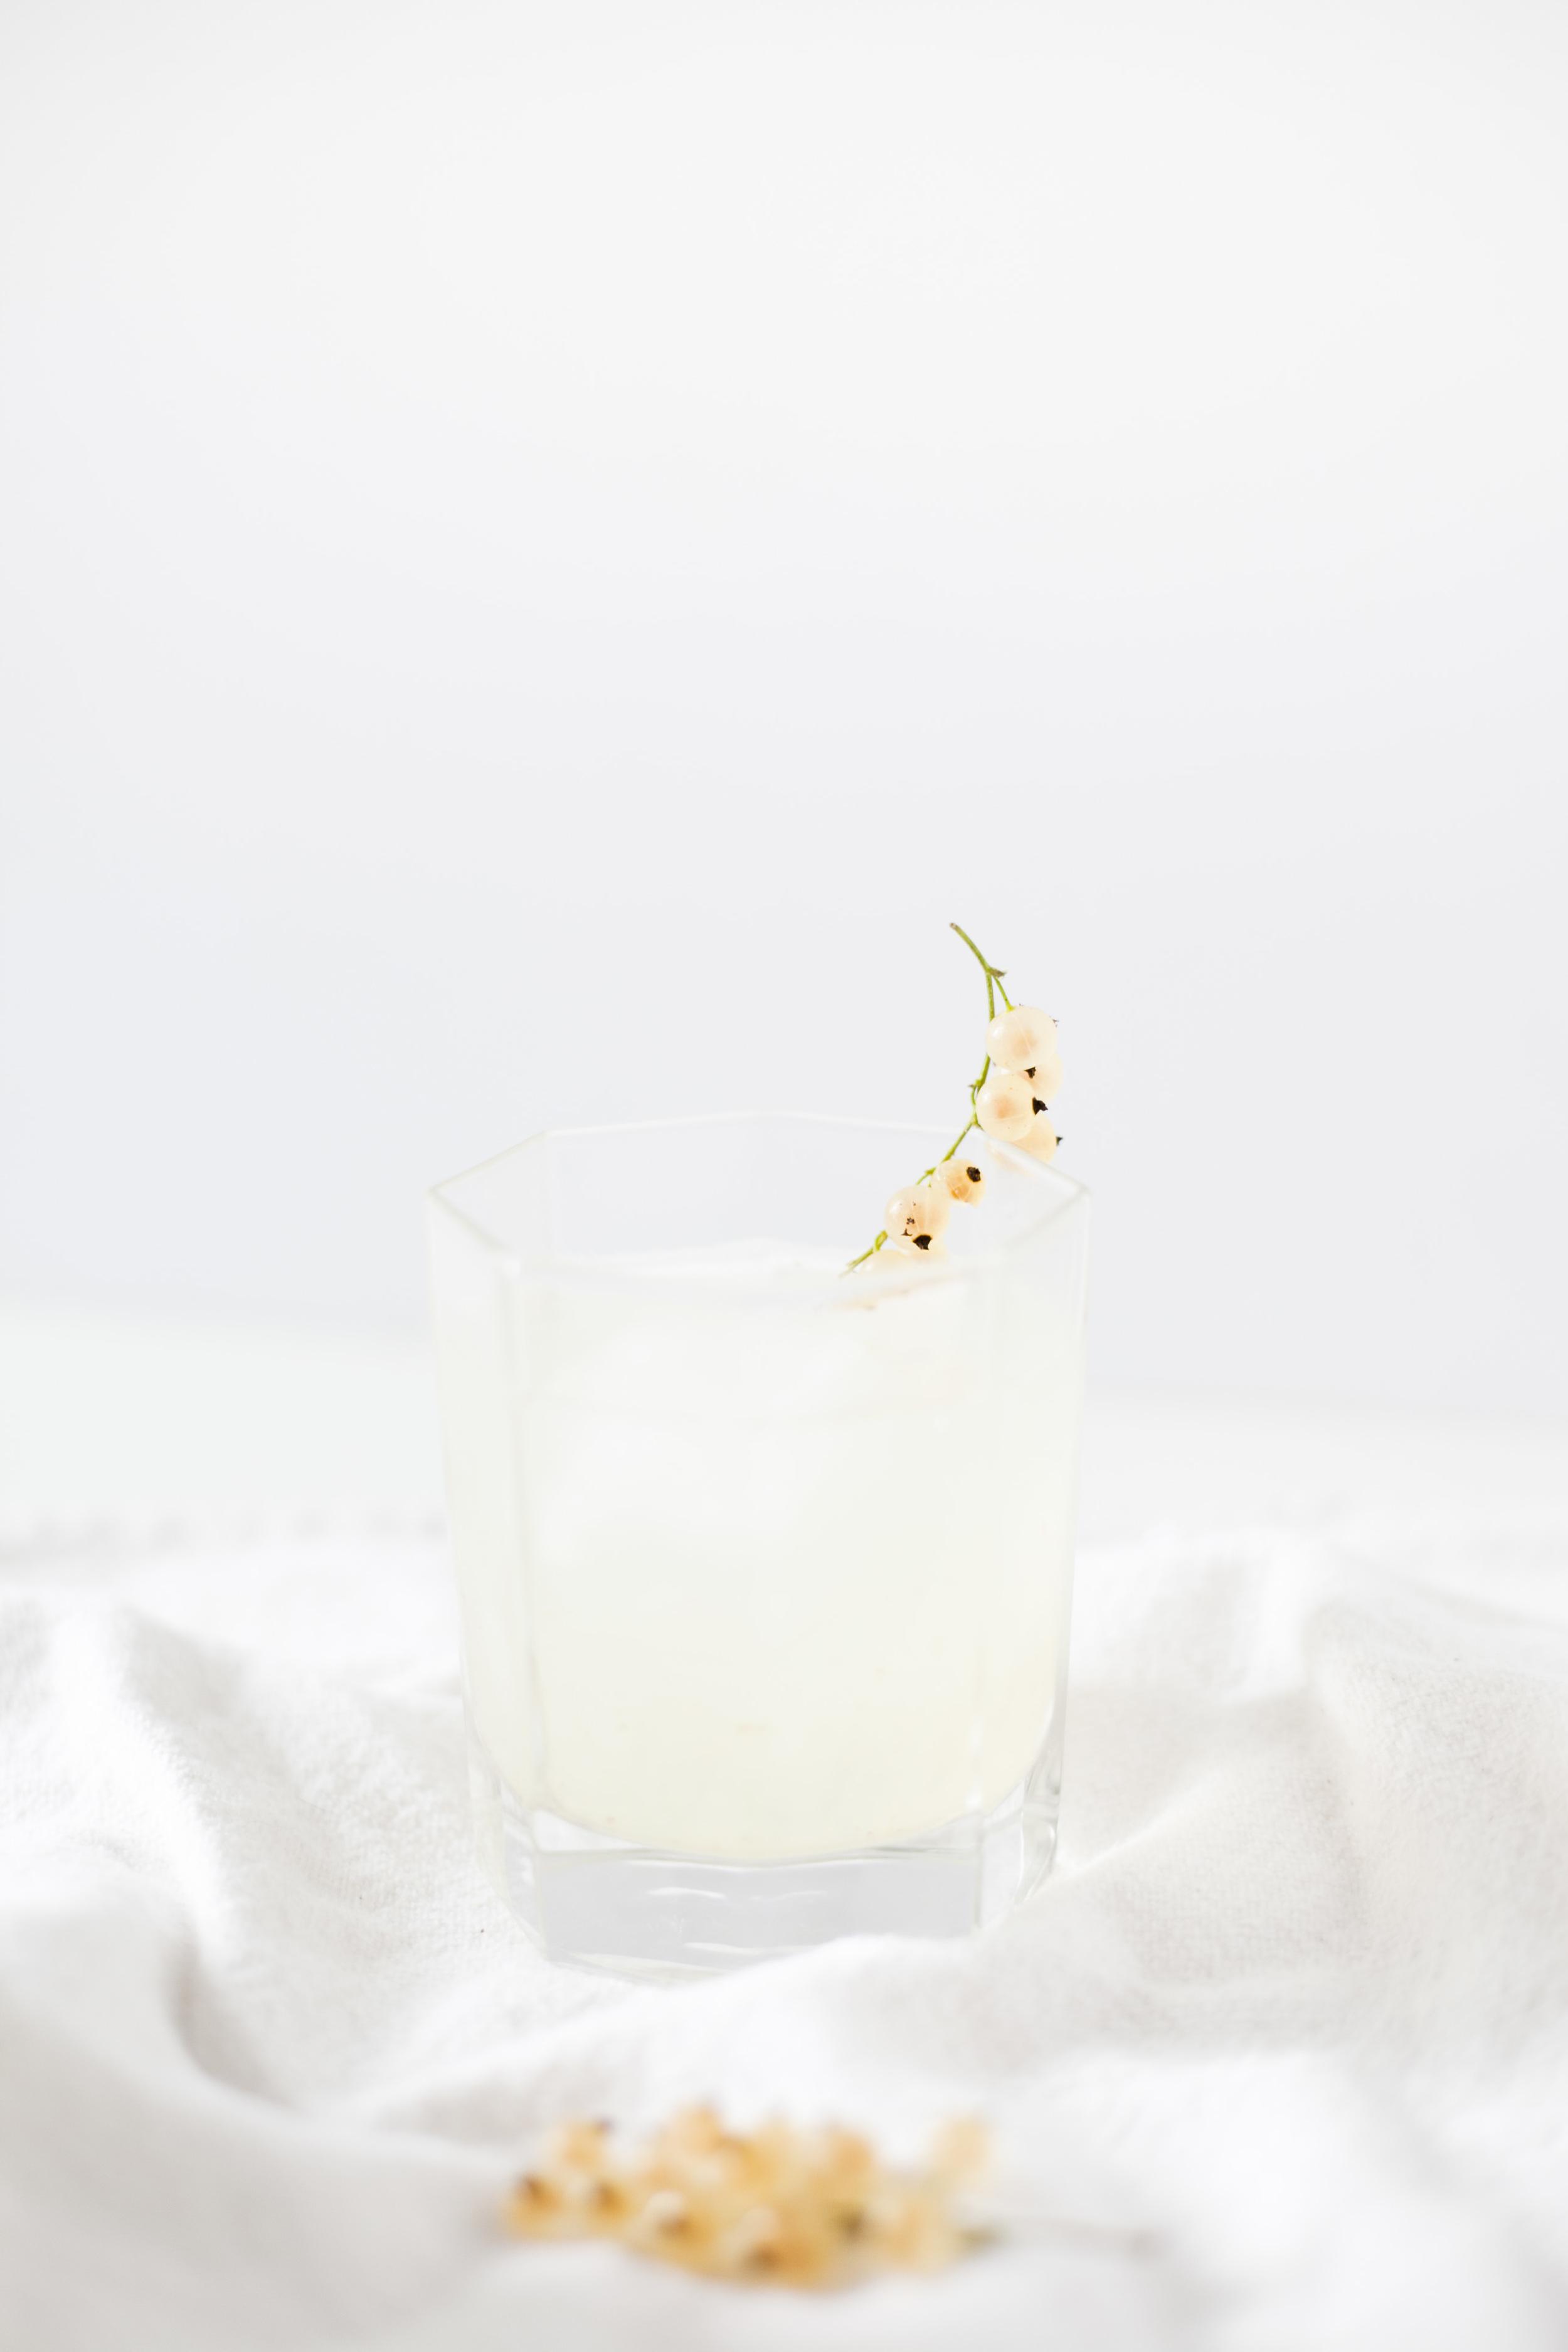 Summer White Currant Lemonade Cocktail